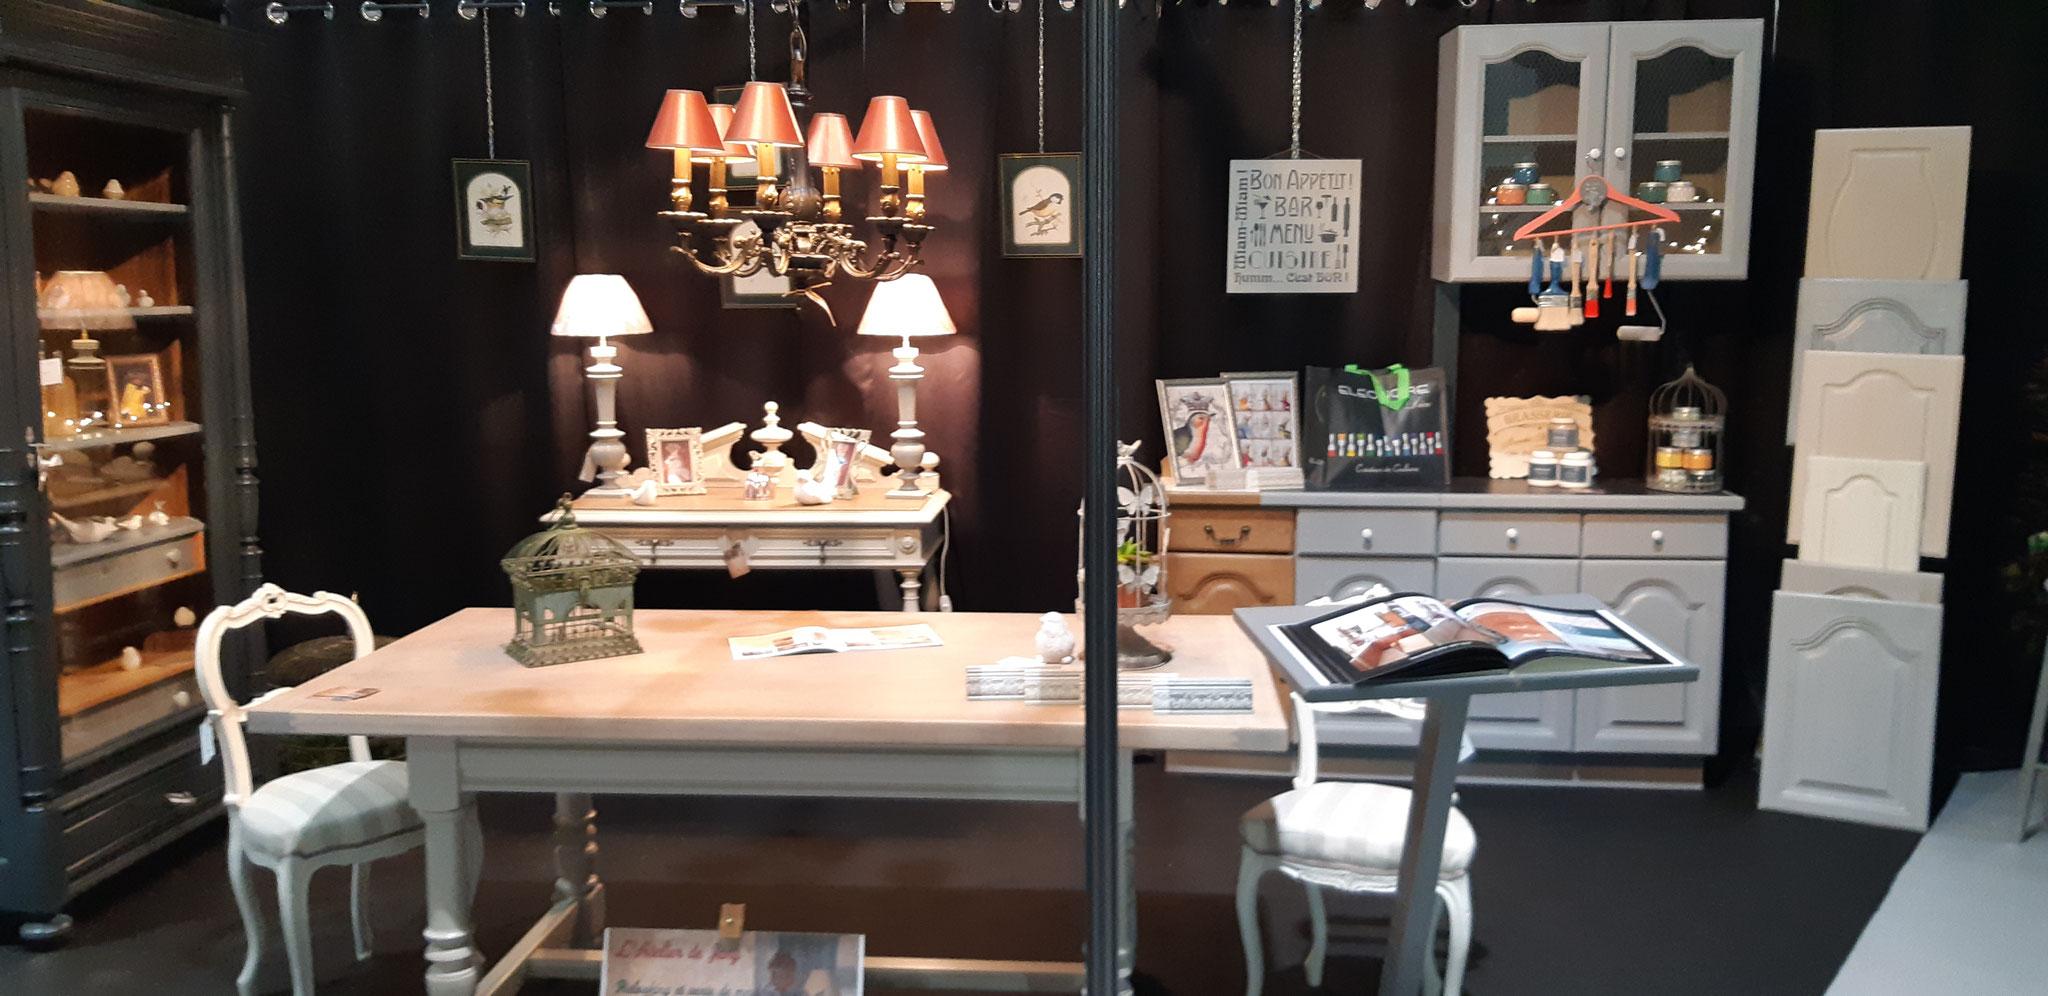 Salon de l'habitat de Cognac septembre 2019